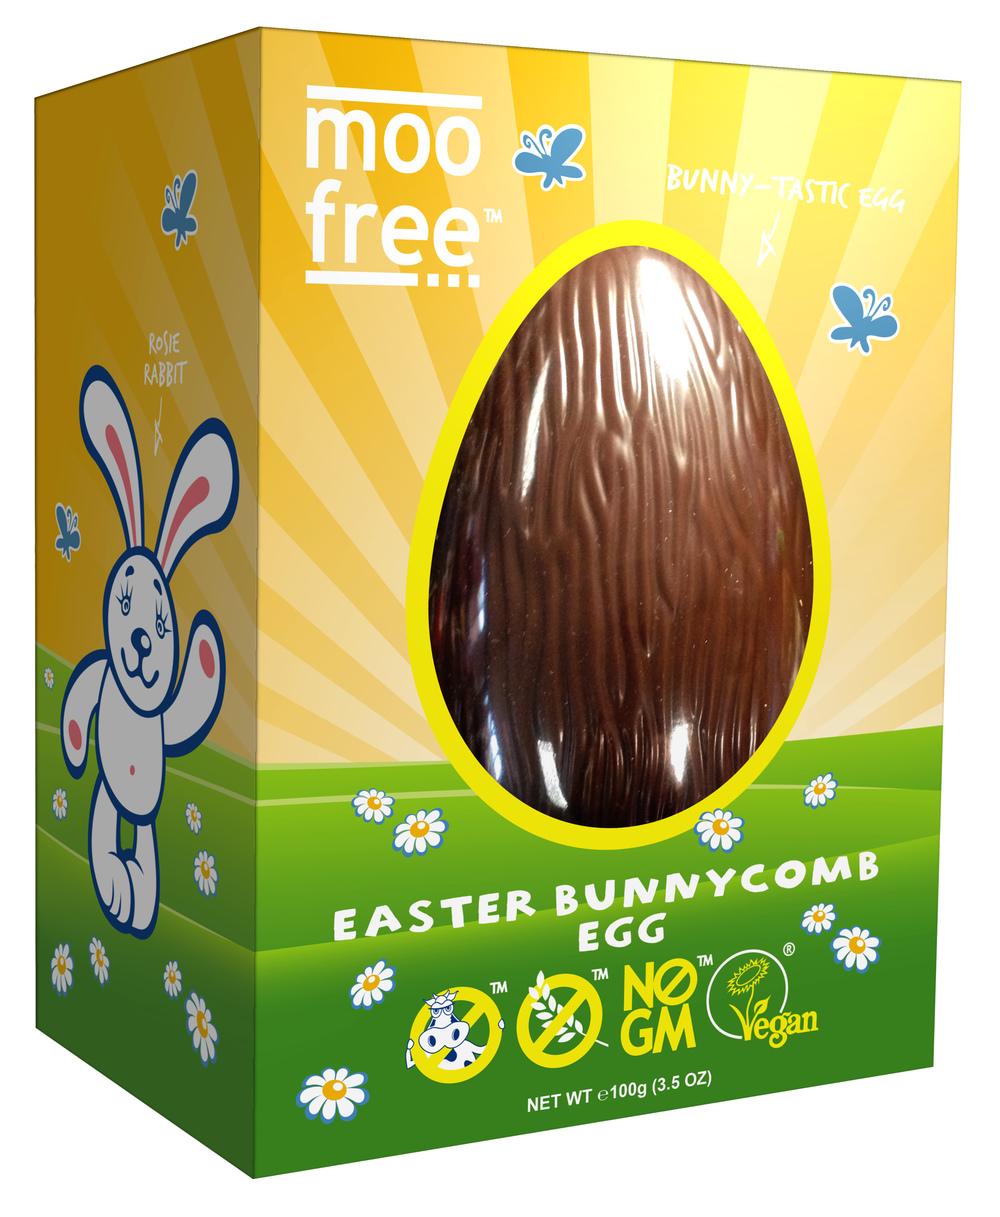 moo-free-bunnycomb-easter-egg-hi-res.jpg